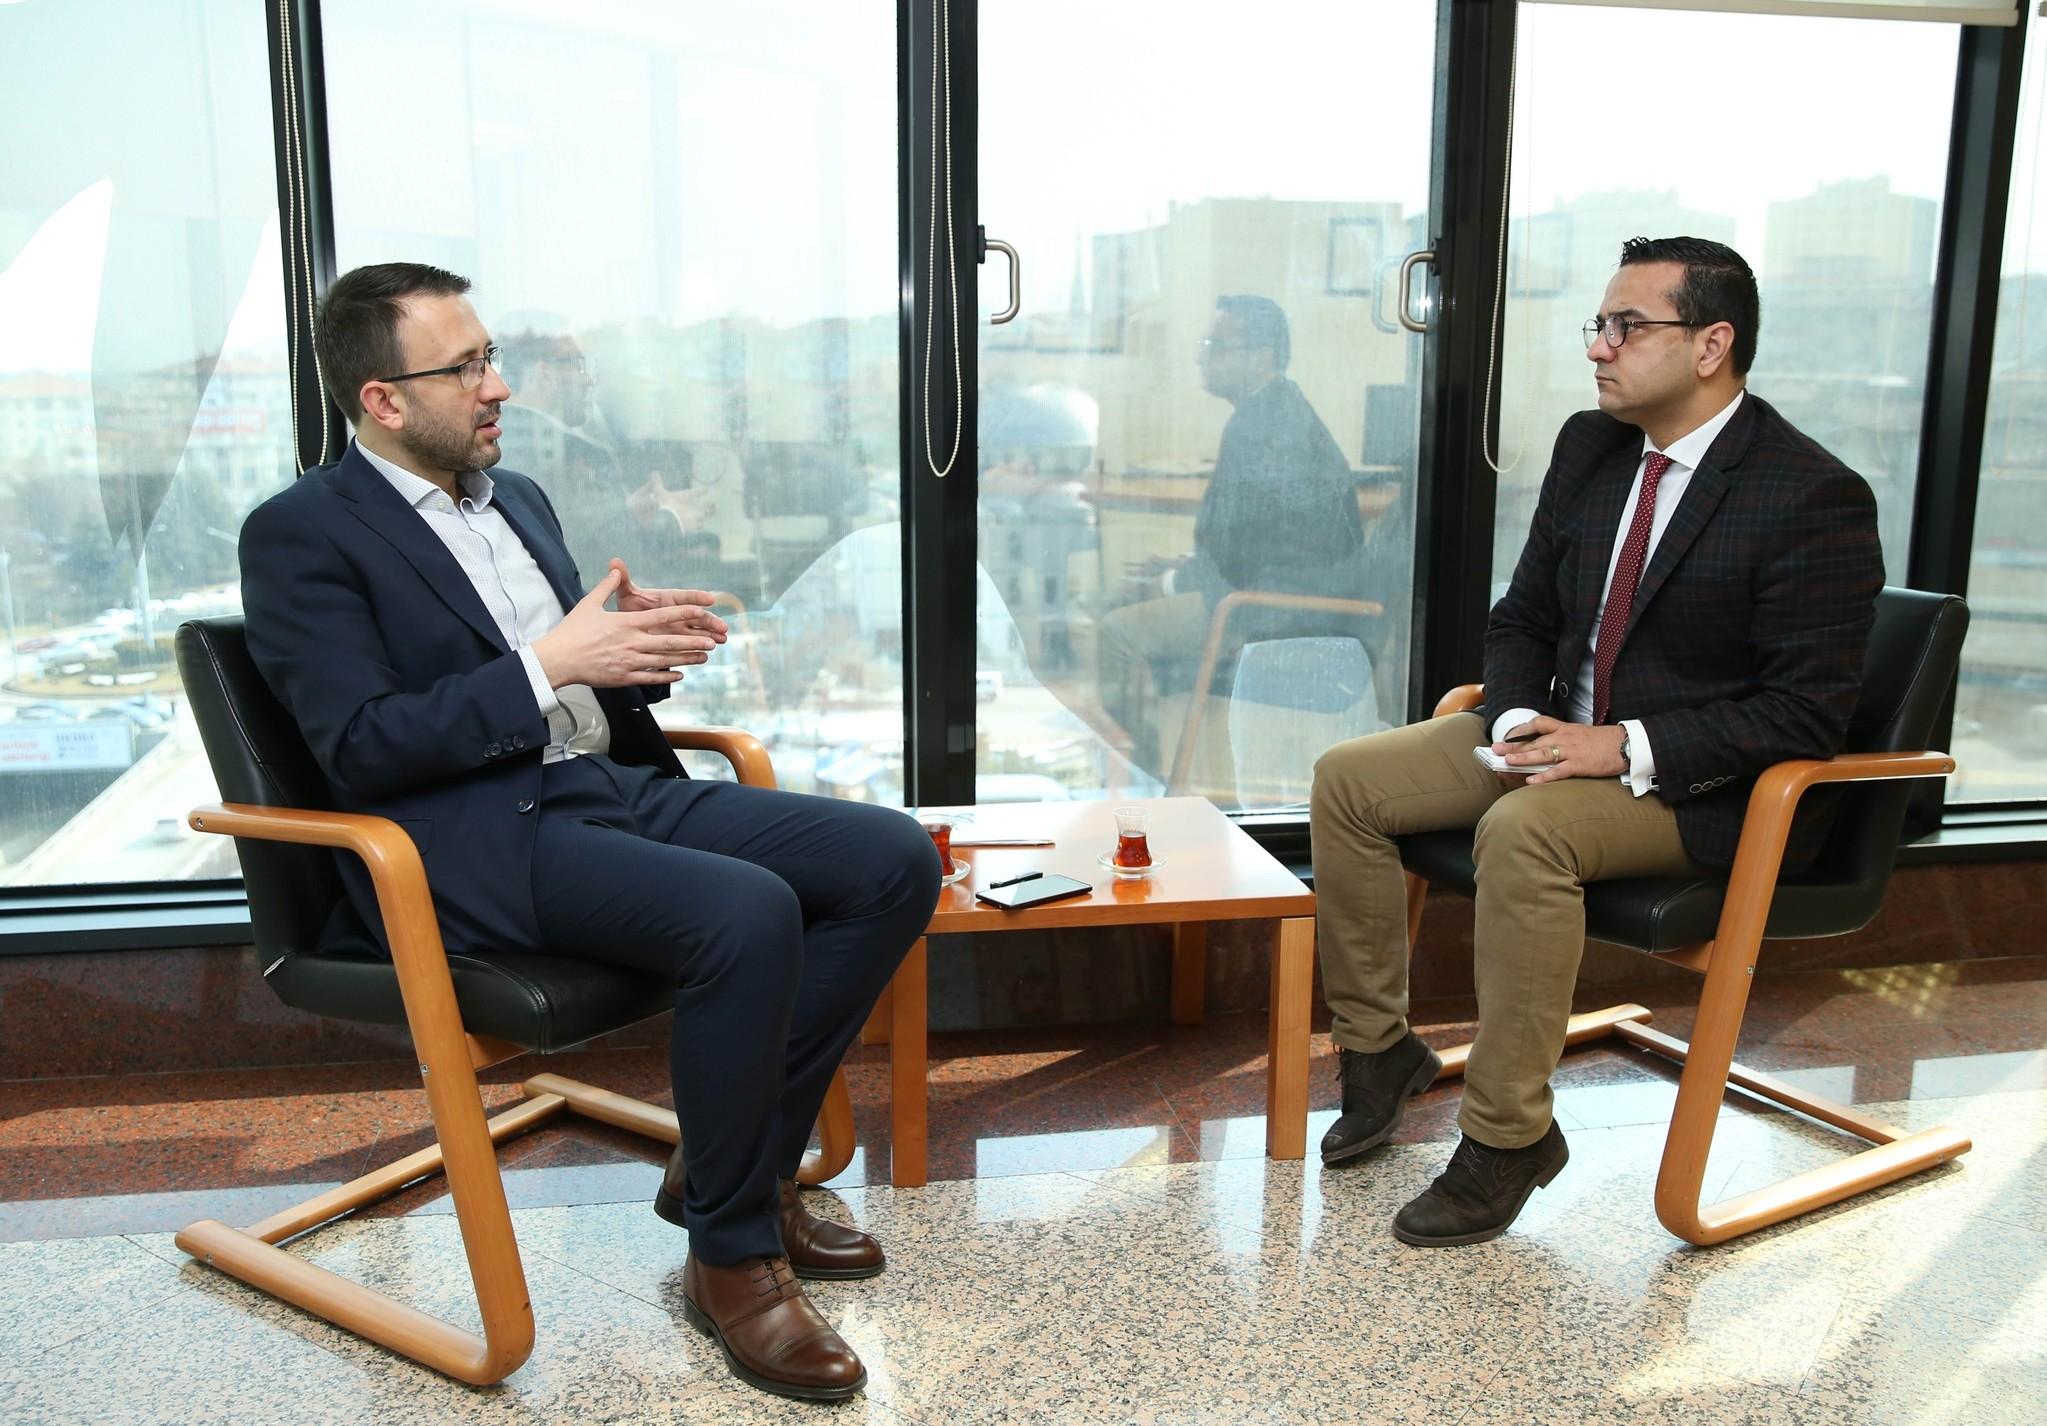 Mehmet Murat Pu00f6steki (L) said the support for u201cYesu201d is over 60 percent in eastern Anatolia and predominantly Kurdish-populated southeastern Anatolia.